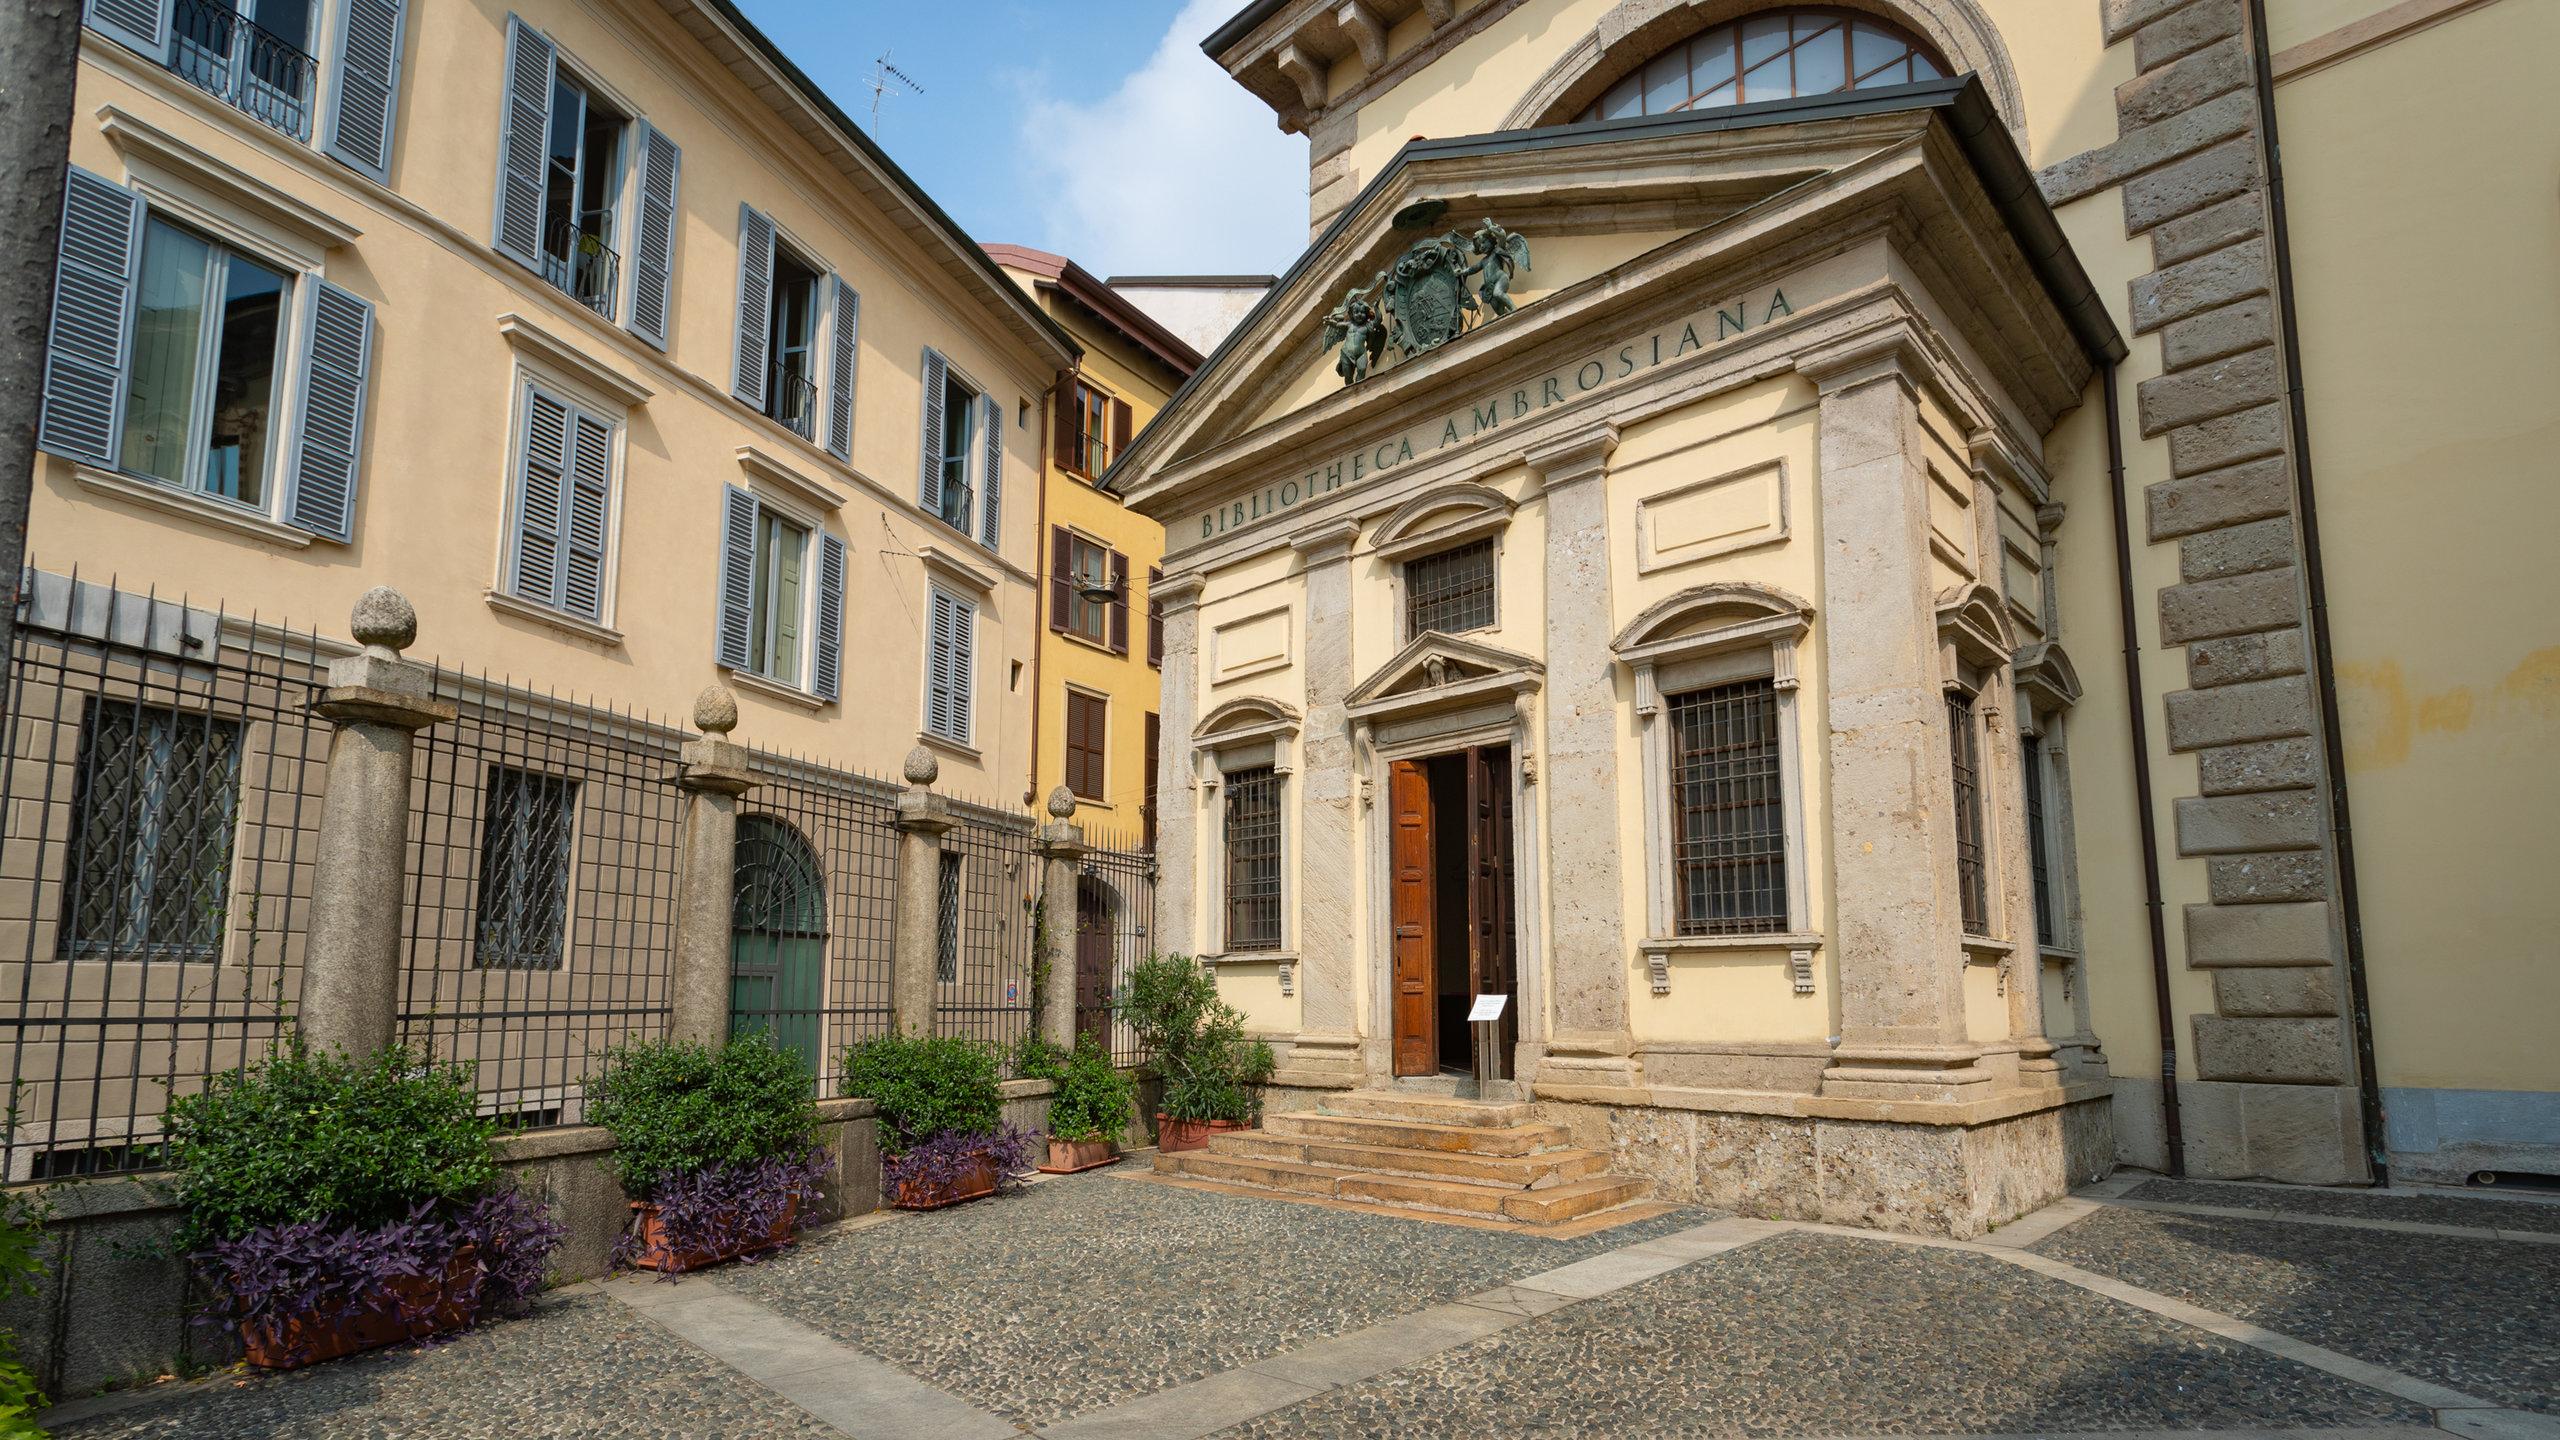 Biblioteca Ambrosiana, Mailand, Lombardei, Italien